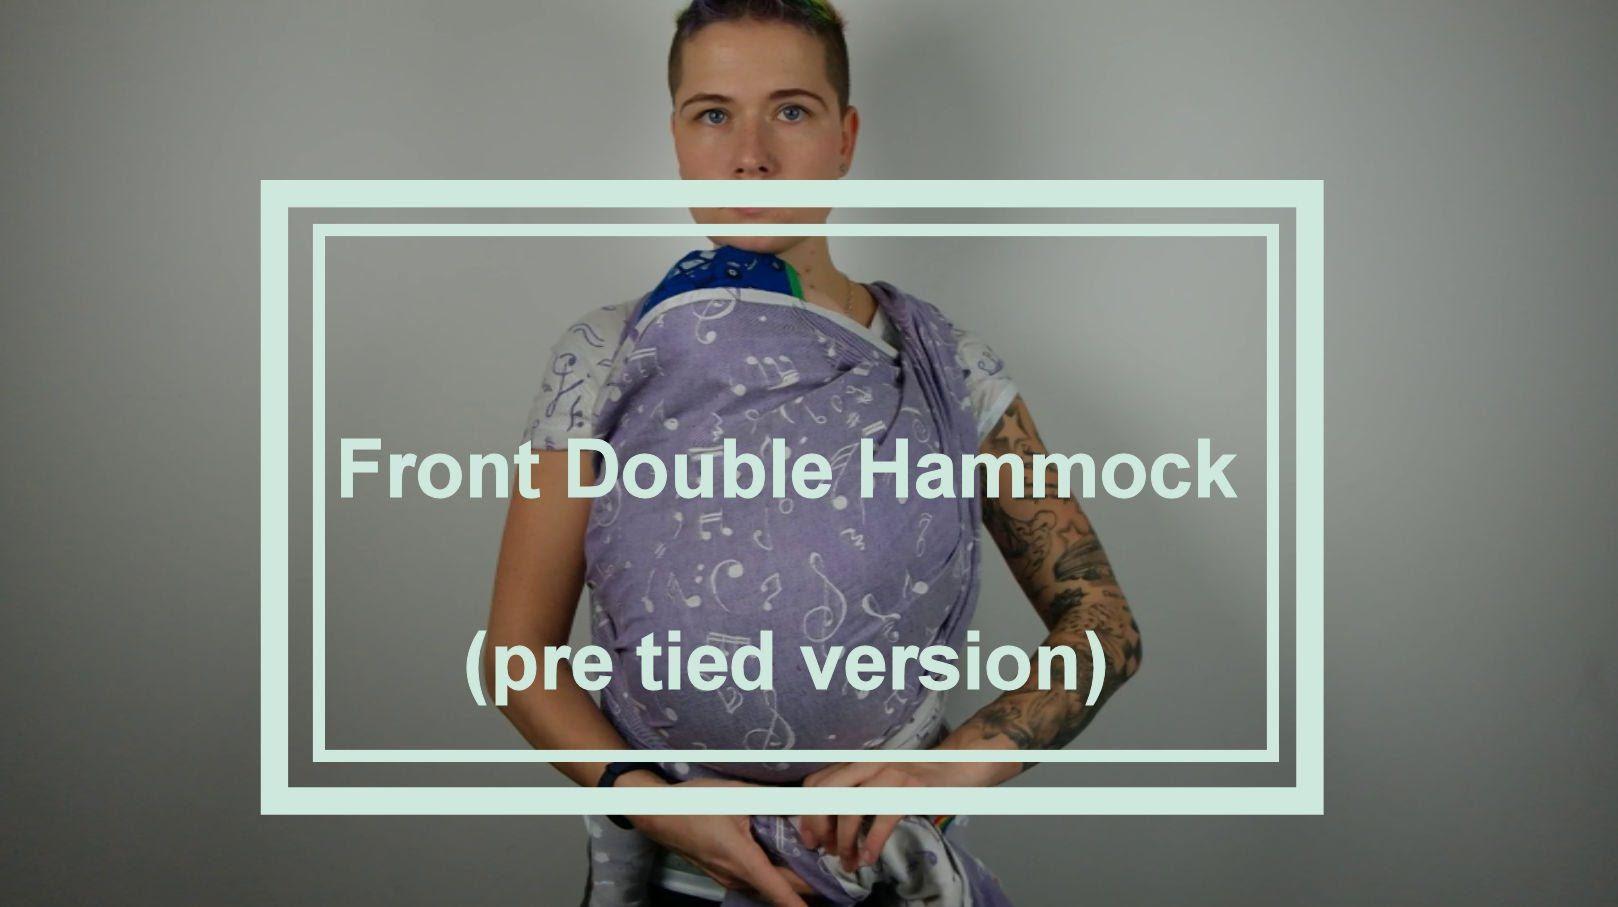 Front Double Hammock